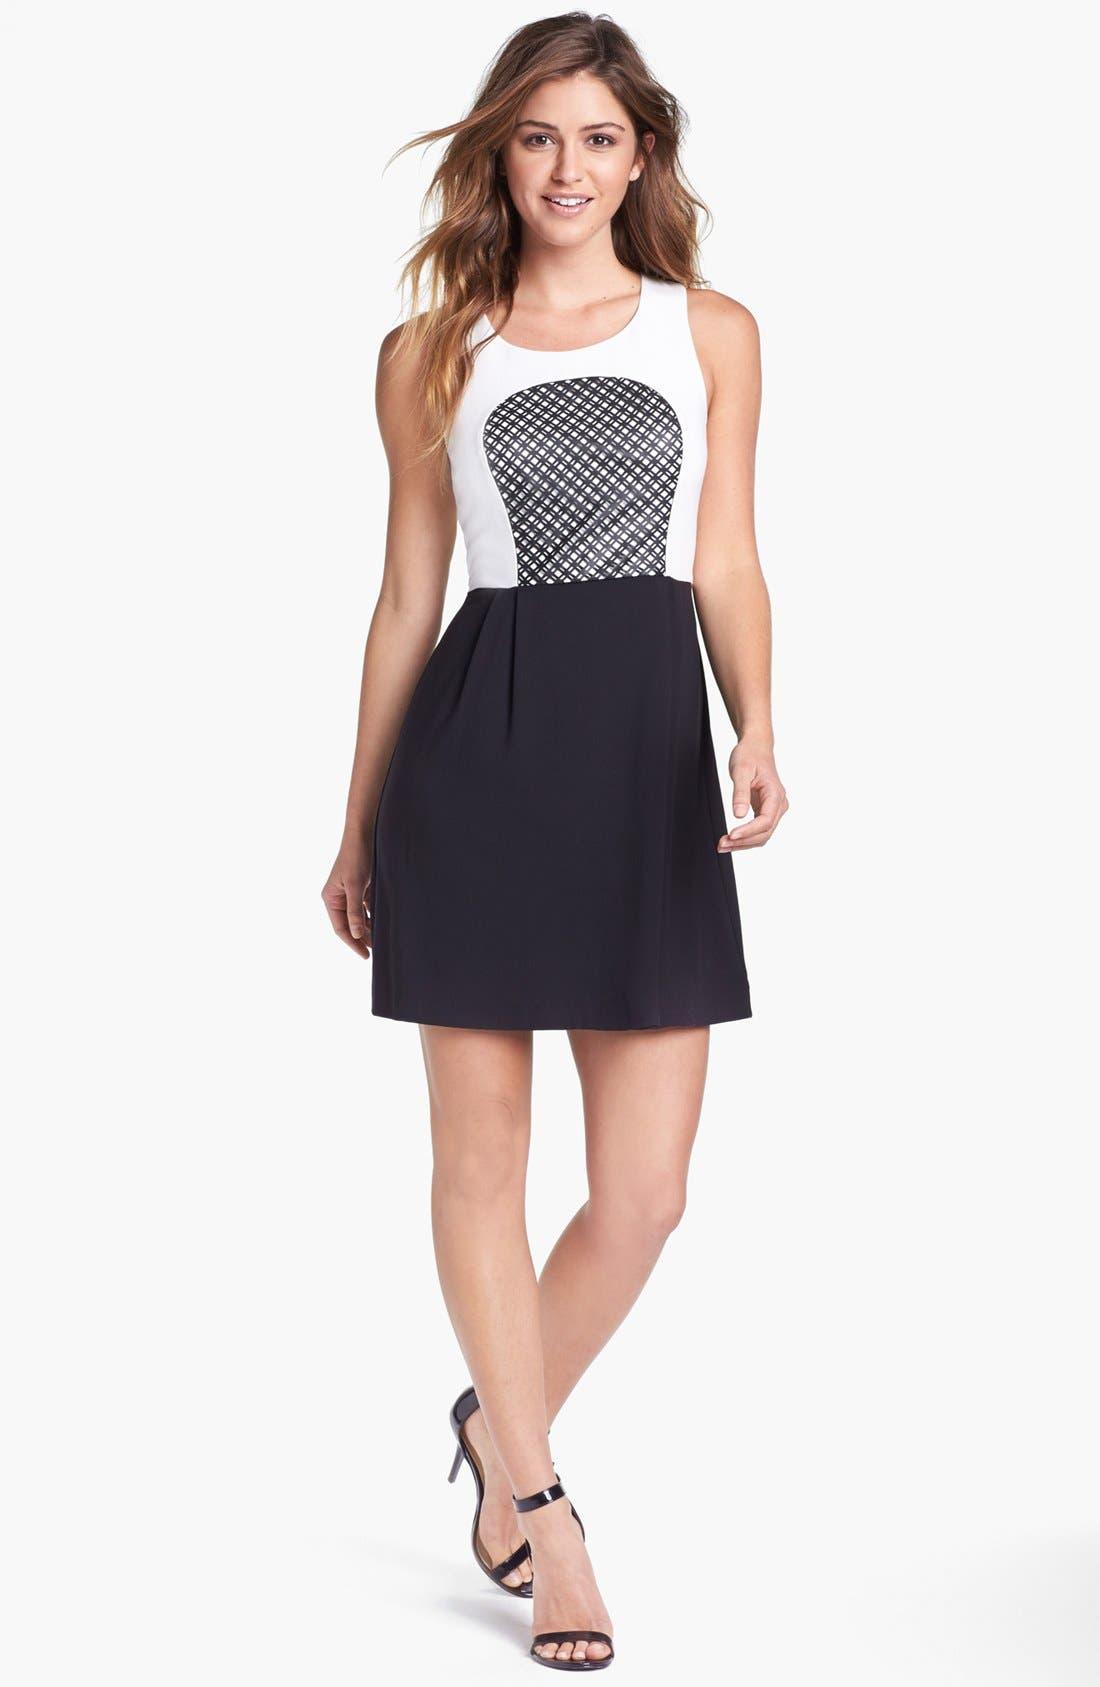 Main Image - kensie Laser Cut Faux Leather Inset Colorblock Dress